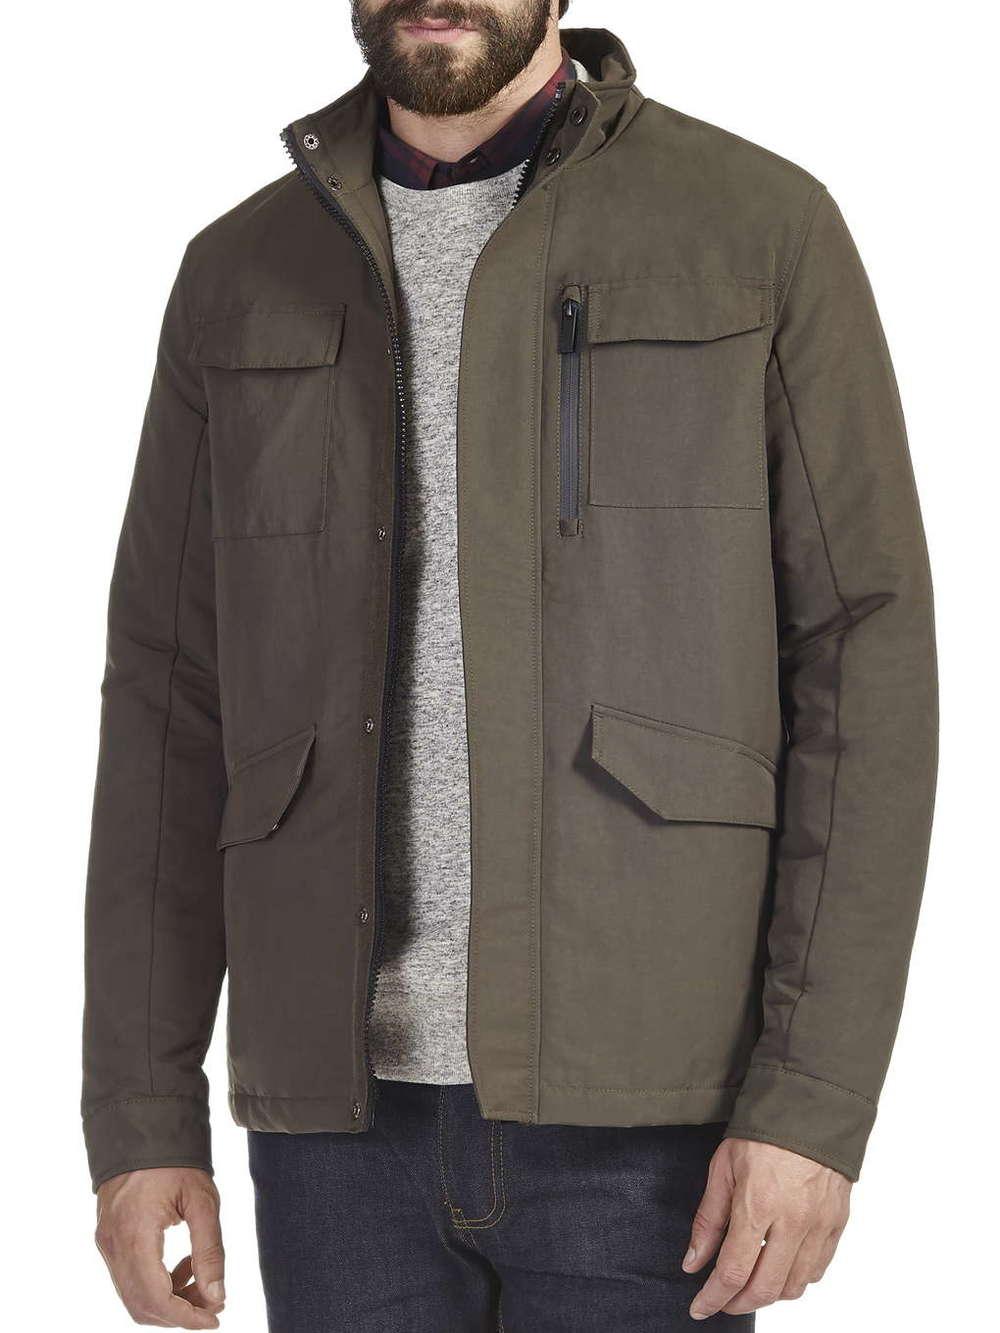 Khaki Military Jacket